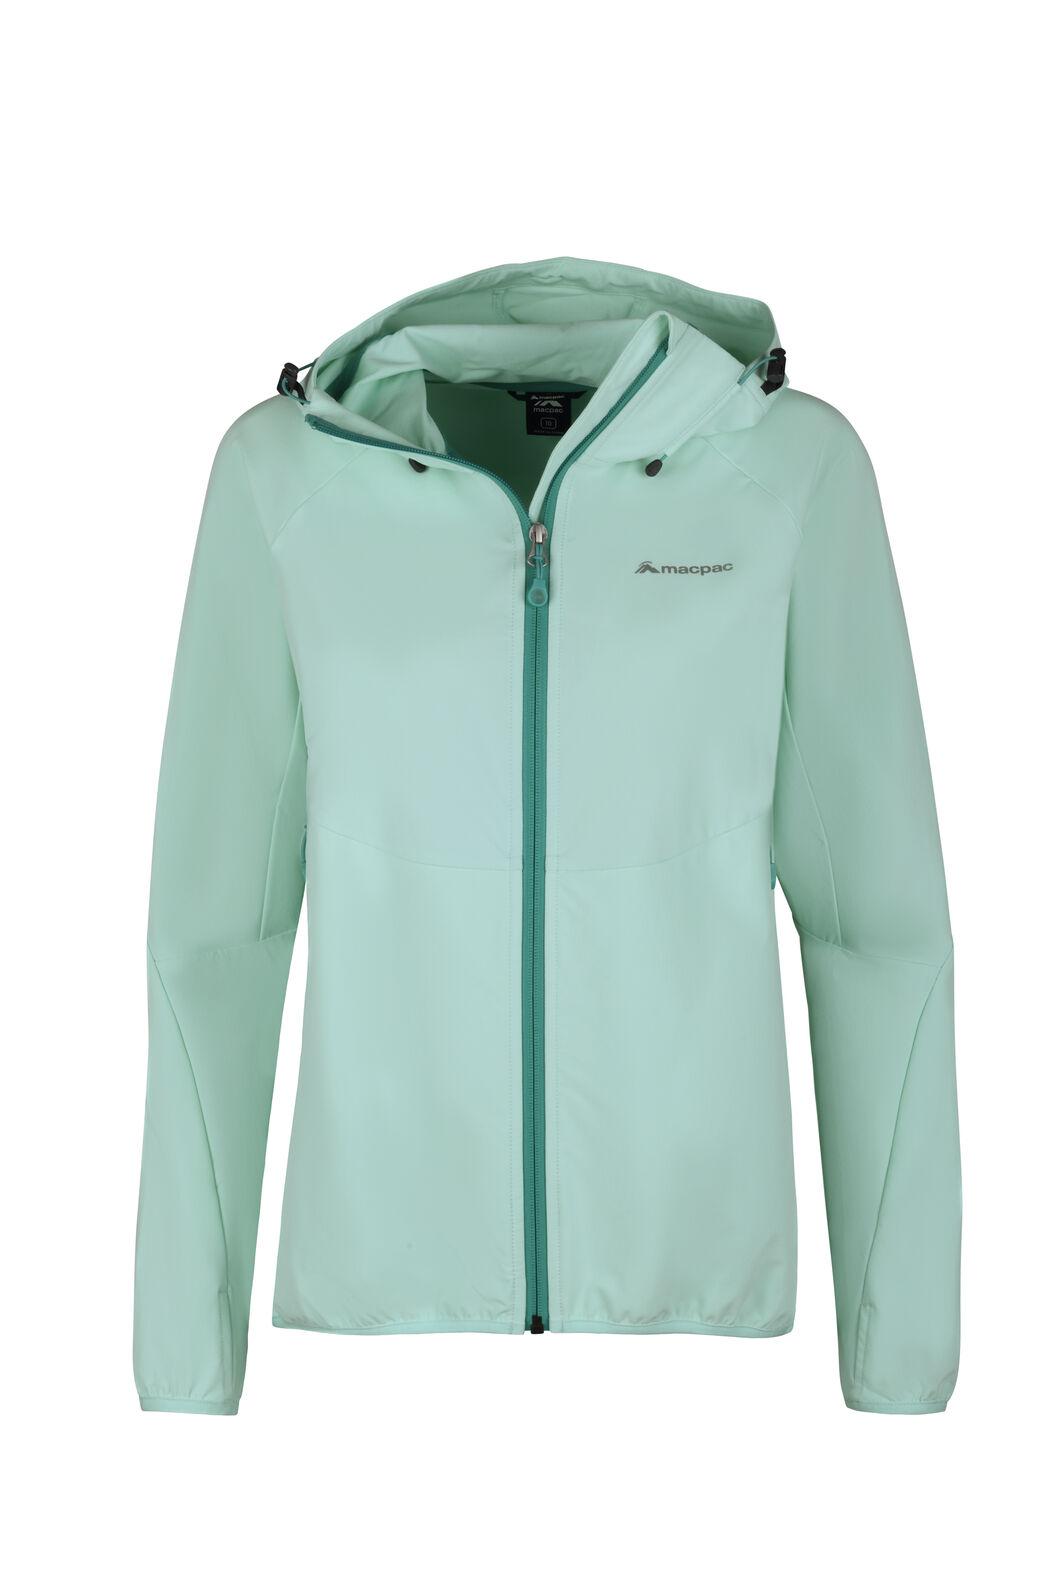 Macpac Mannering Pertex® Hooded Jacket — Women's, Beach Glass, hi-res